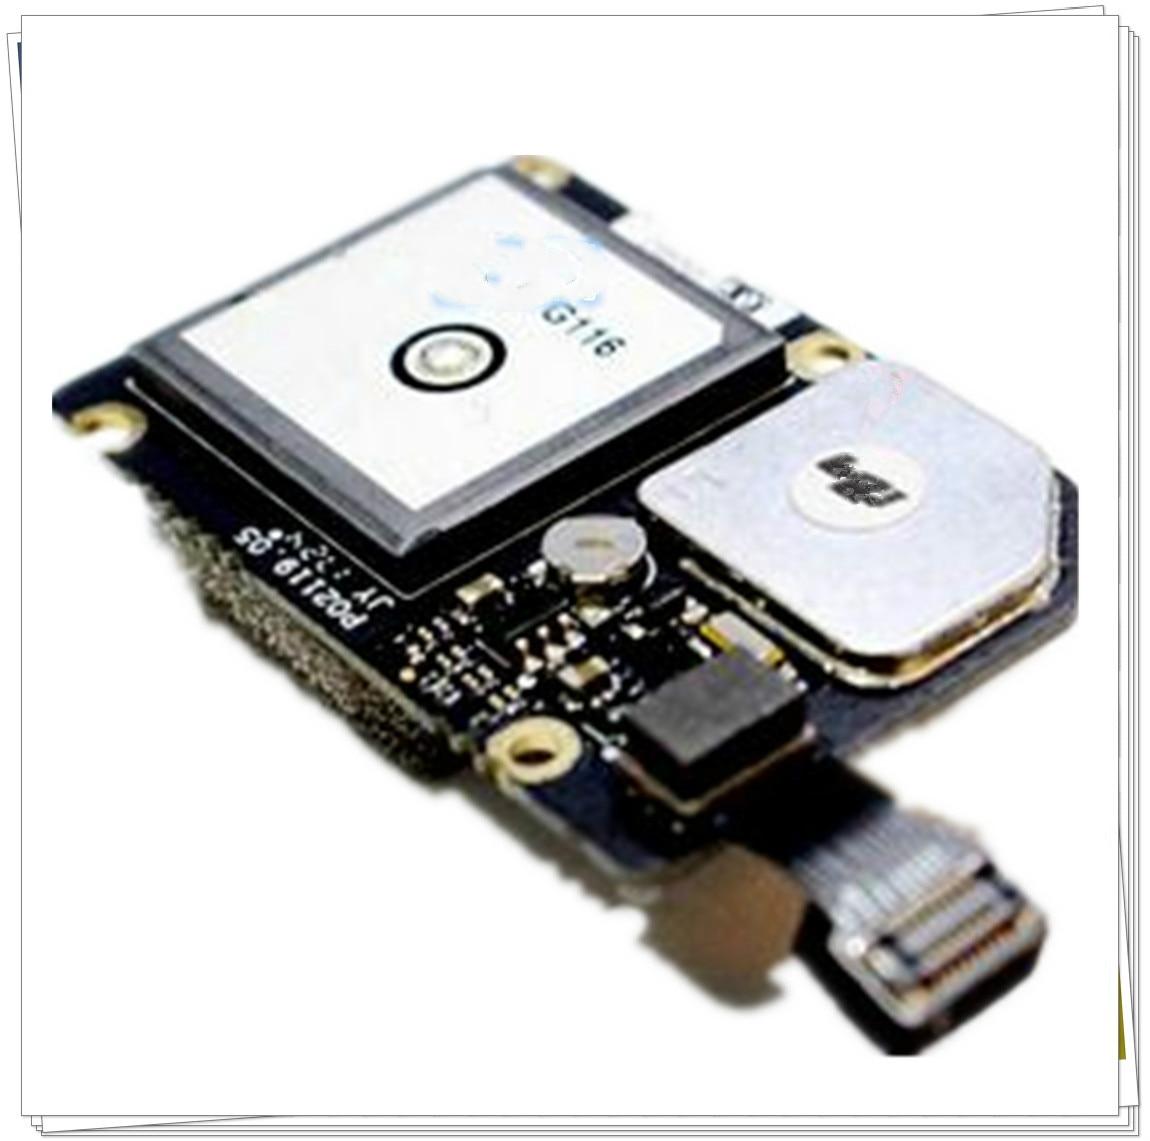 For DJI Spark Drone GPS Module GLONASS Board Flight Controller Accessories Repair Parts Component Original